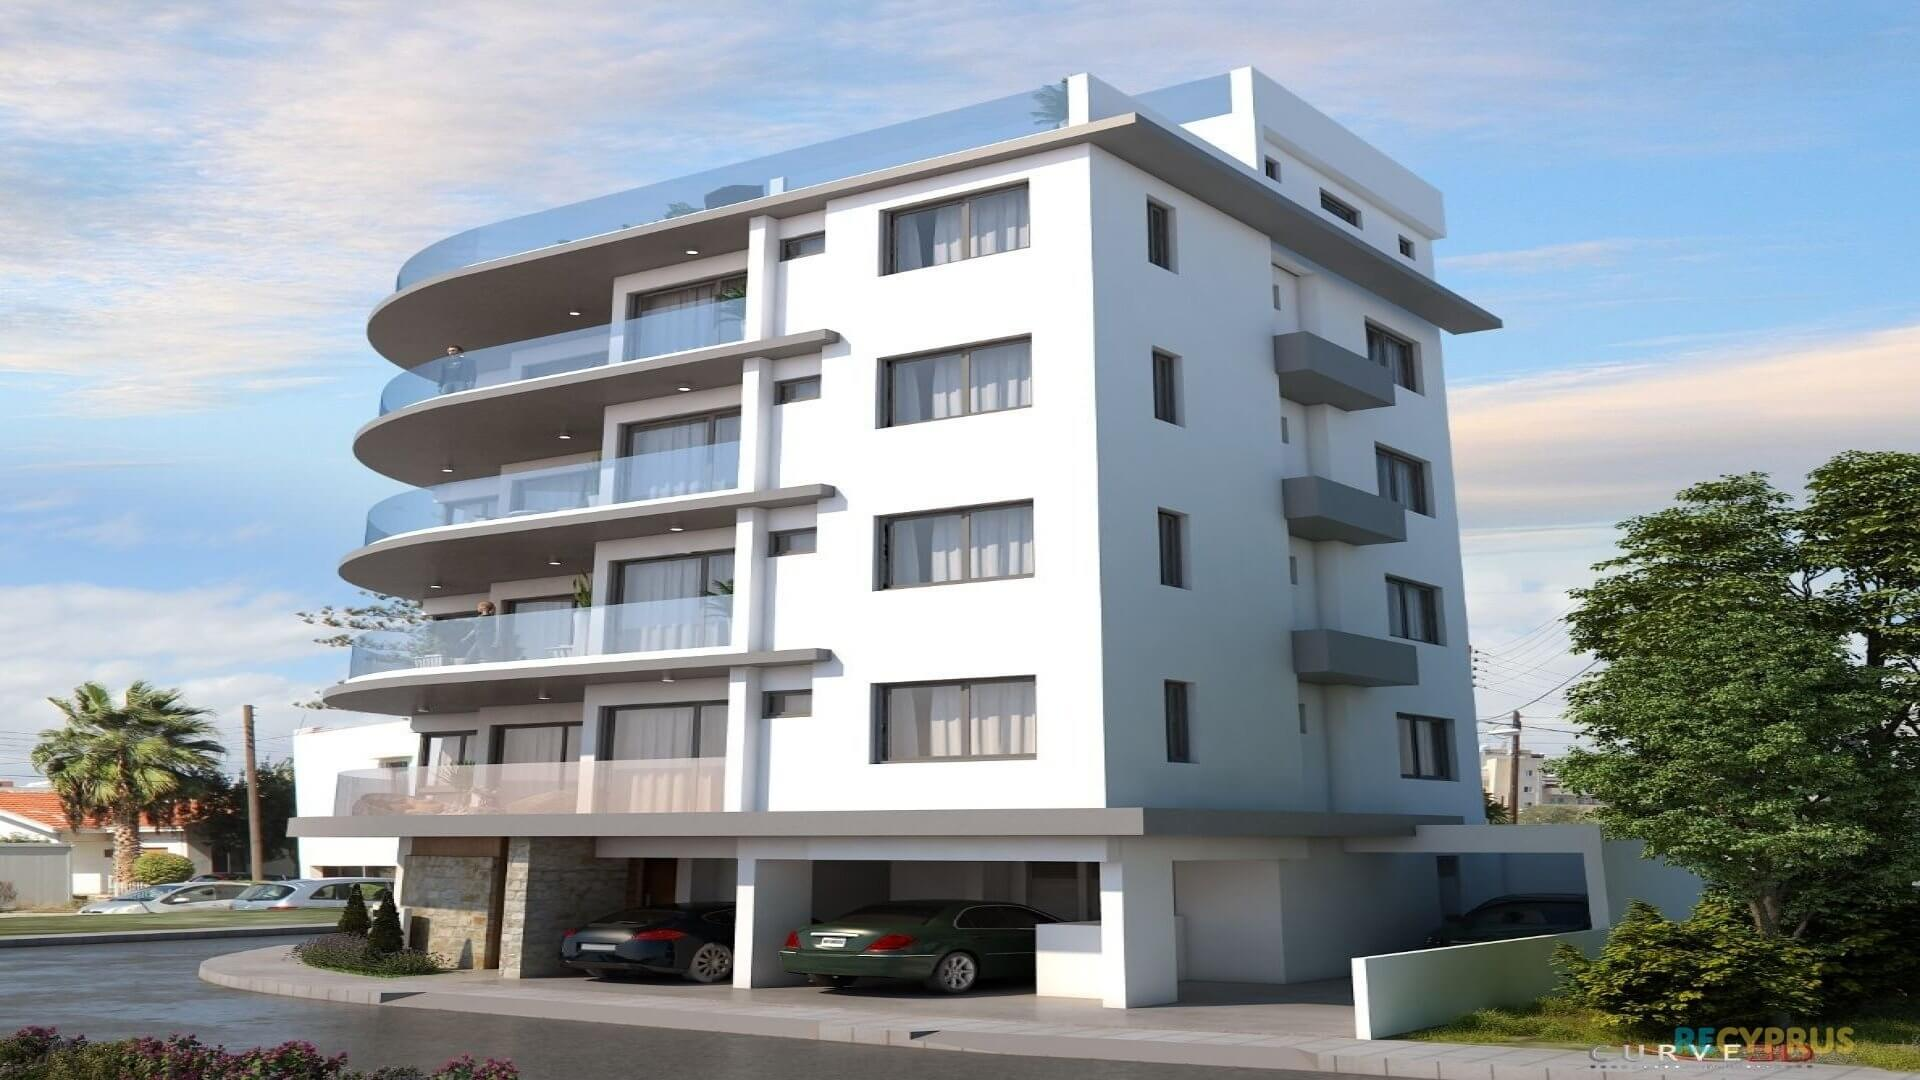 Apartment for sale City Center Larnaca Cyprus 1 3598